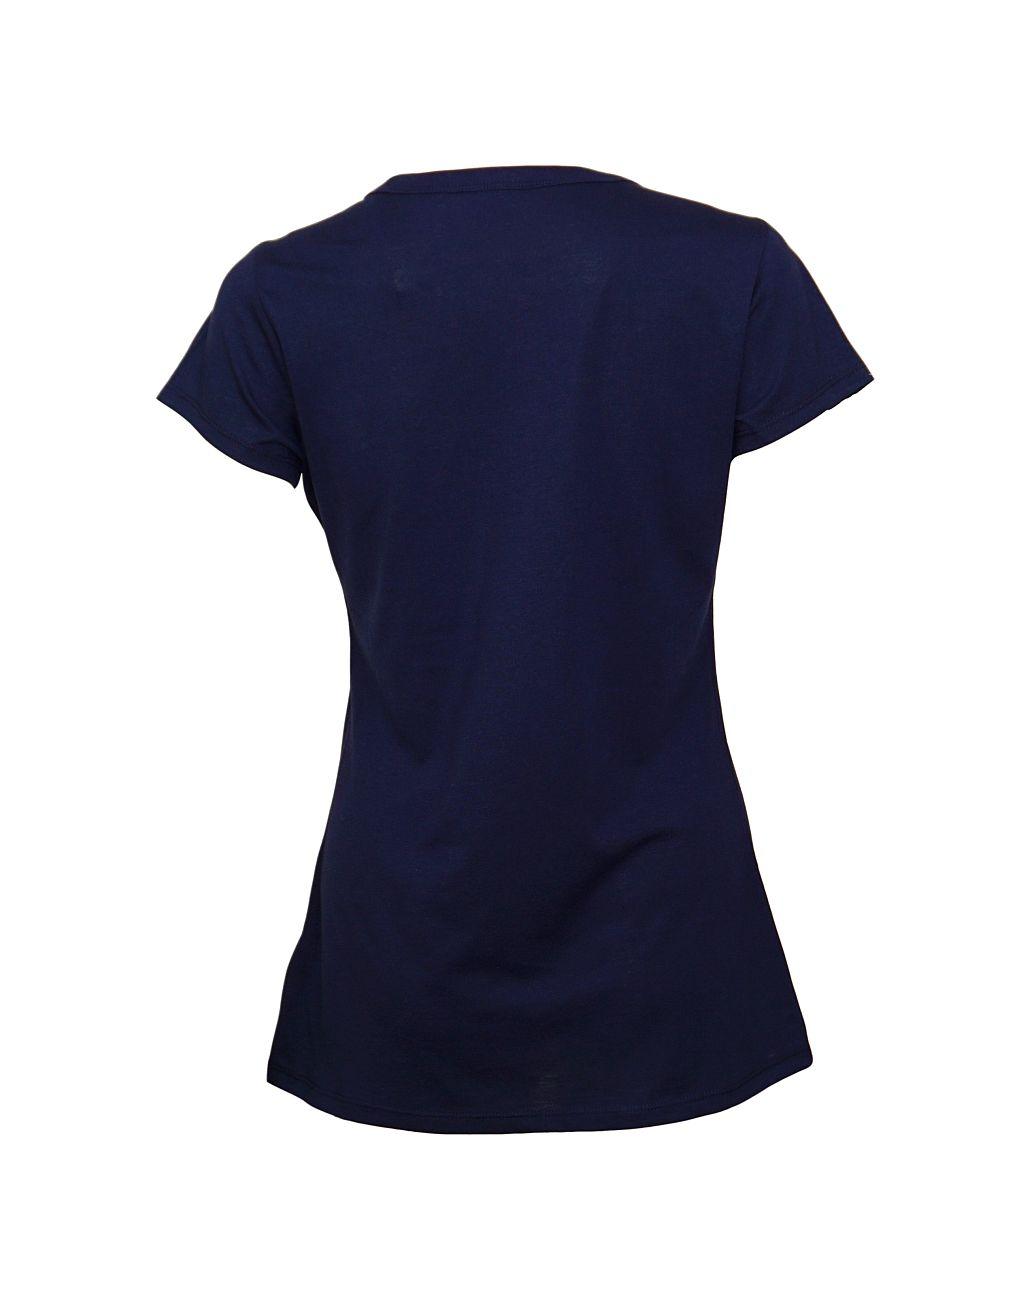 G-Star RAW Damen Shirt T-Shirt Eyben slim D04432 2757 6067 Sartho Blue F18-GSD1